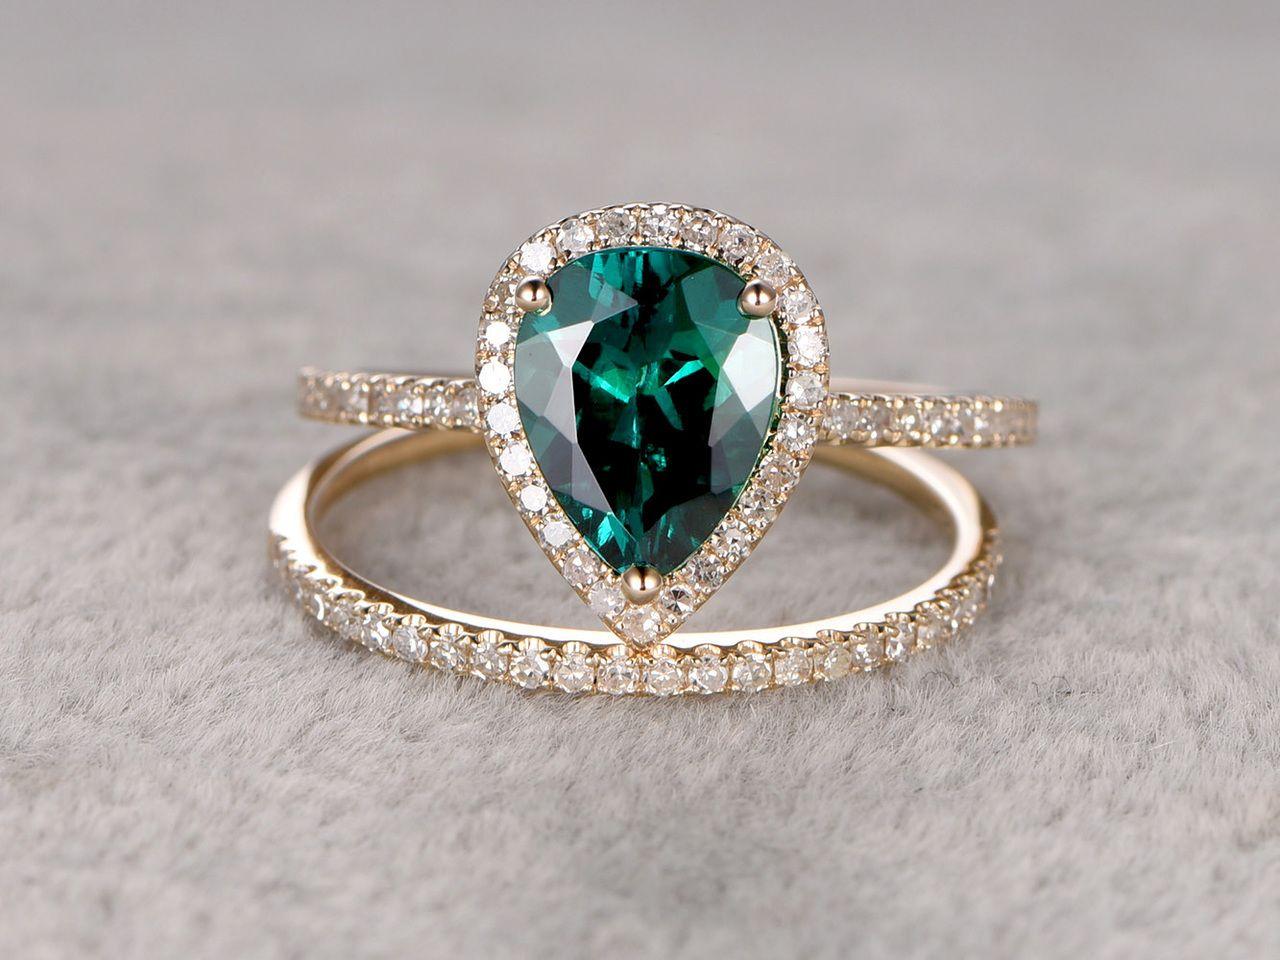 ce46ee0b9e1 6x8mm Pear Cut Emerald Wedding Set Diamond Bridal Ring 14k Yellow Gold Pave  Thin Matching Band - BBBGEM